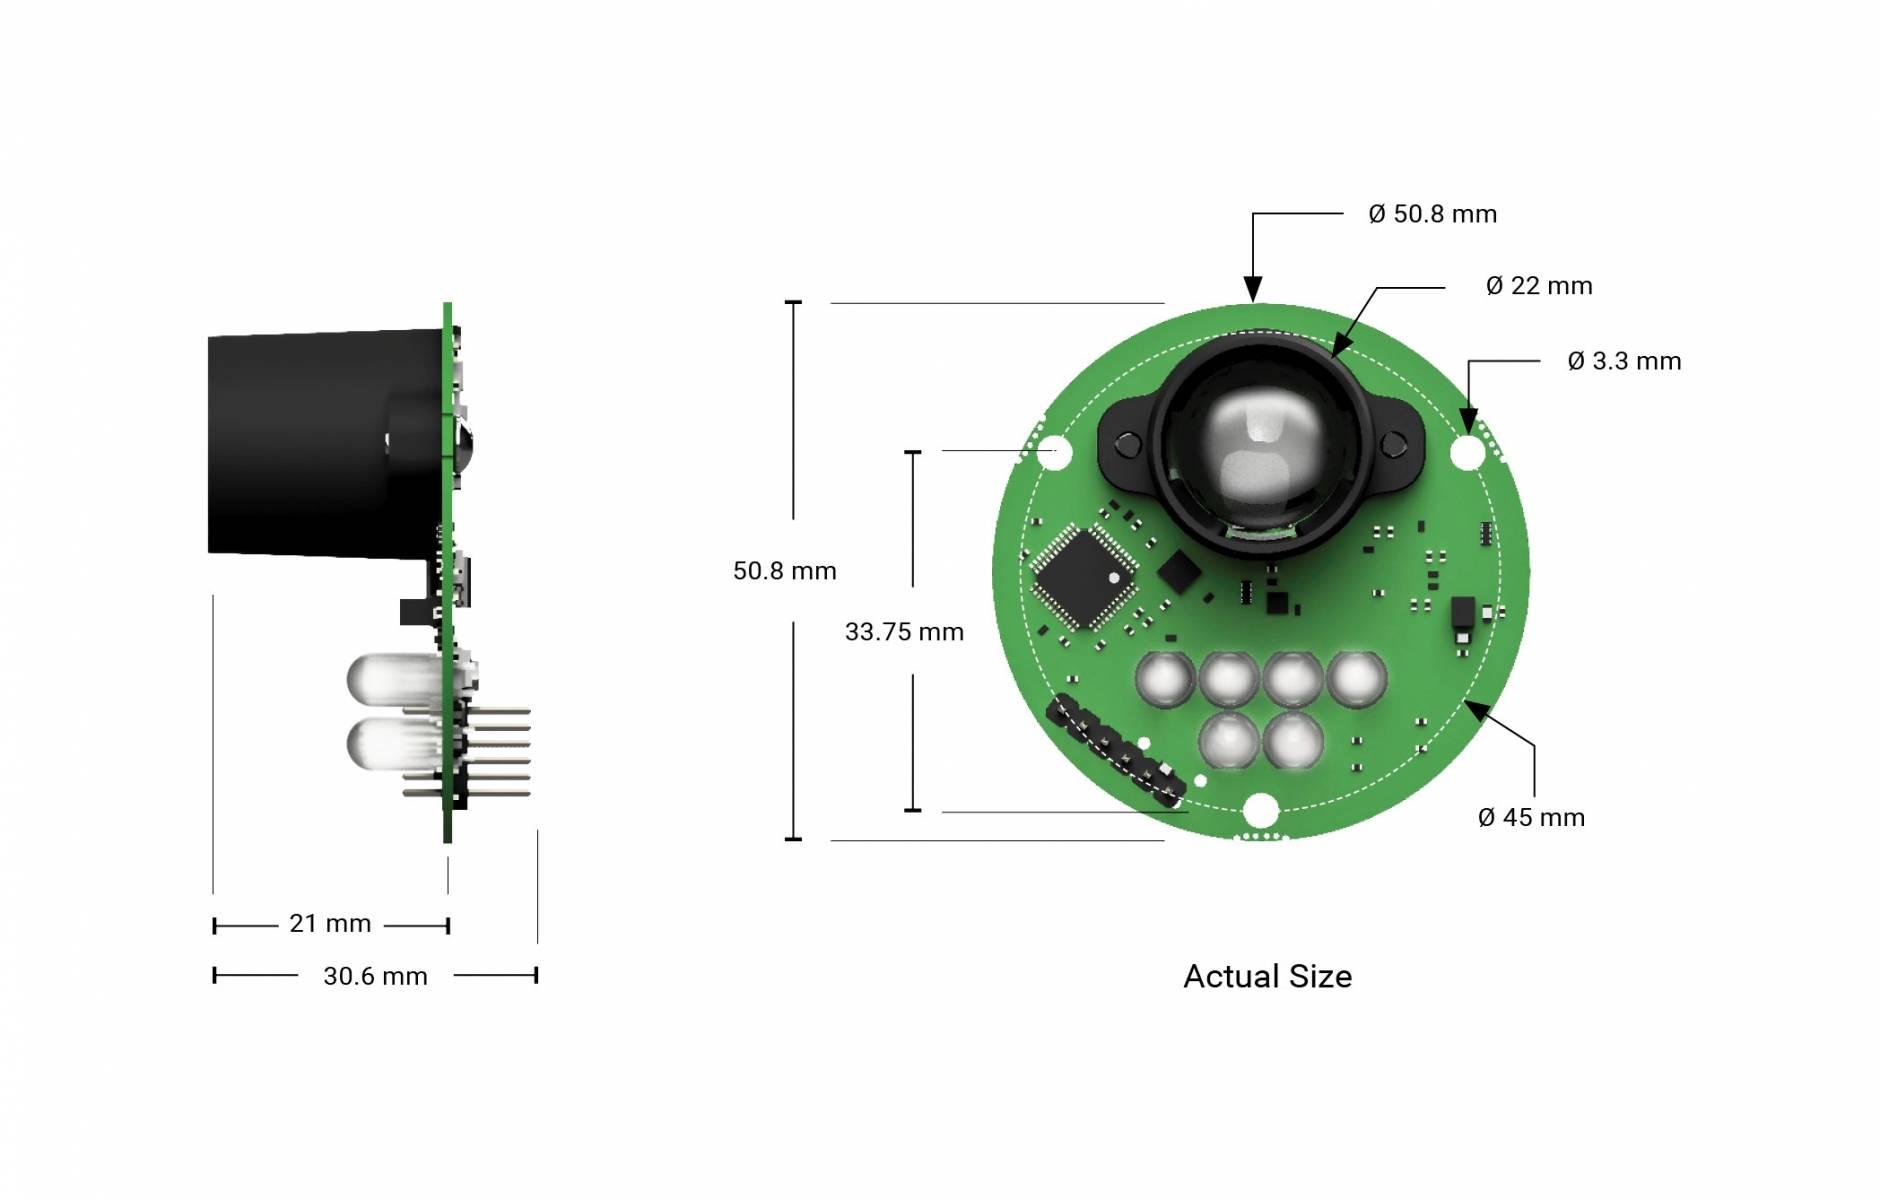 LeddarOne Single Element LiDAR Sensor Module | LeddarTech